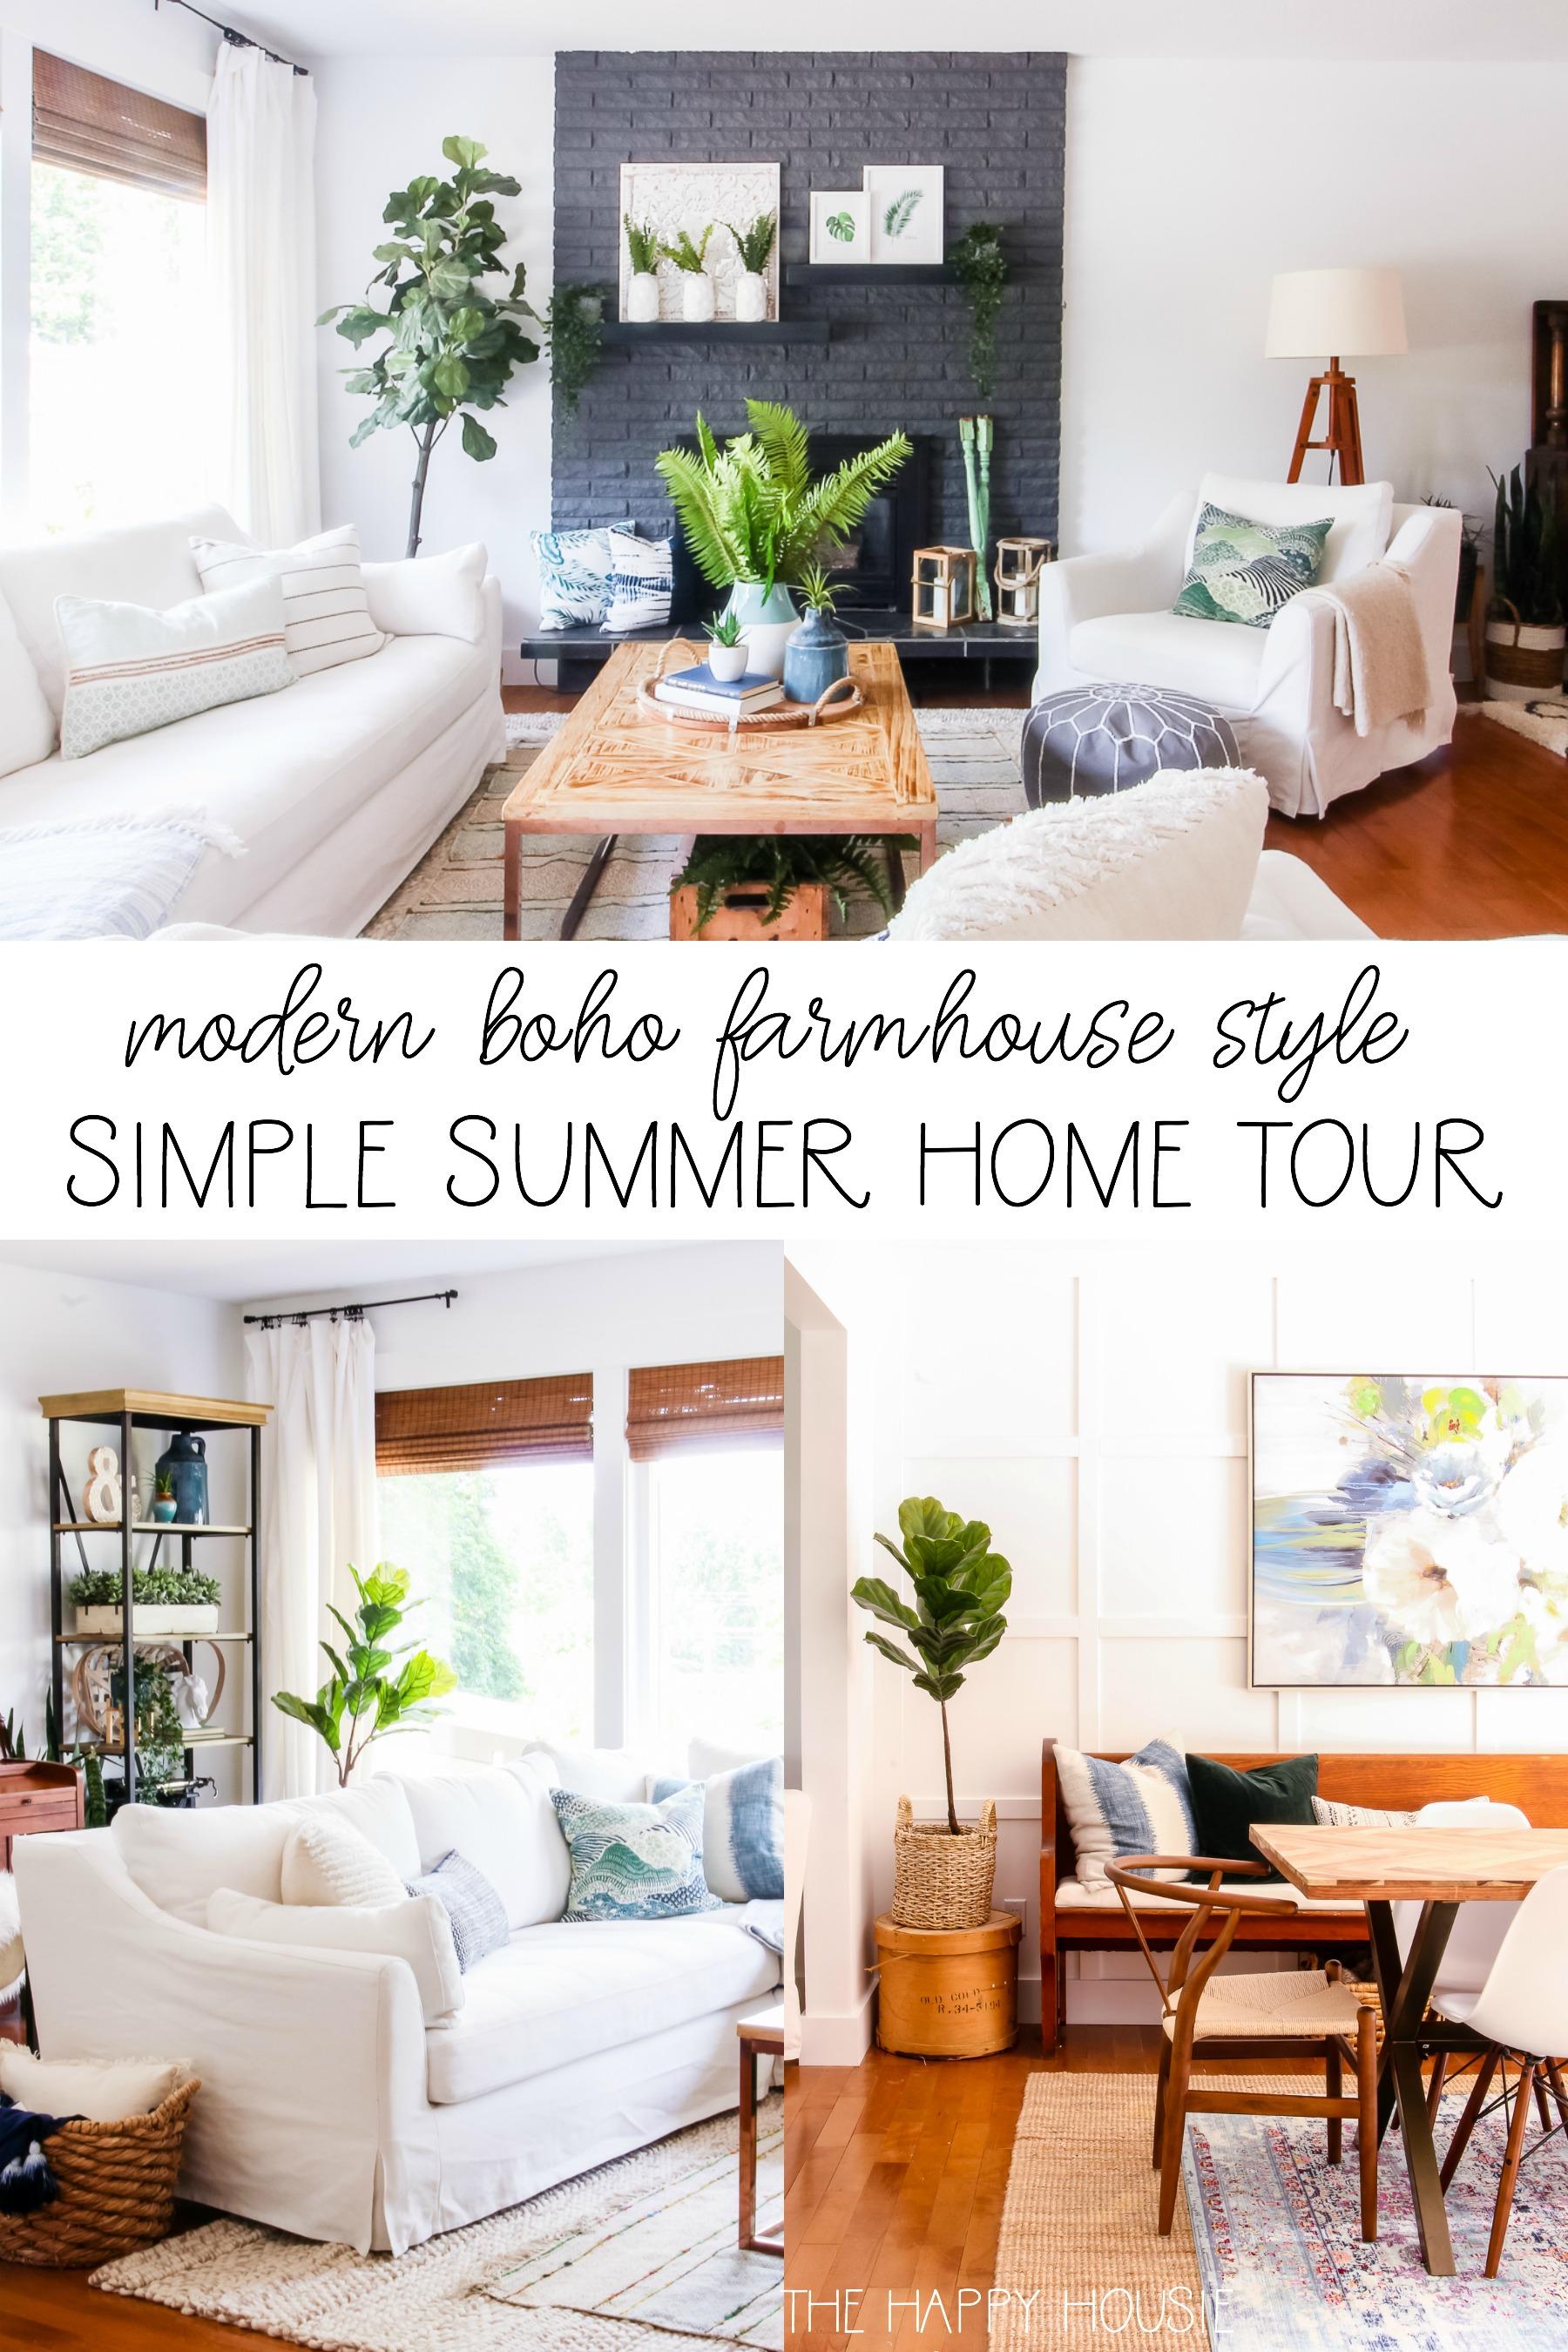 Modern Boho Farmhouse Style Simple Summer Home Tour | The ... on Modern Boho Decor  id=69339